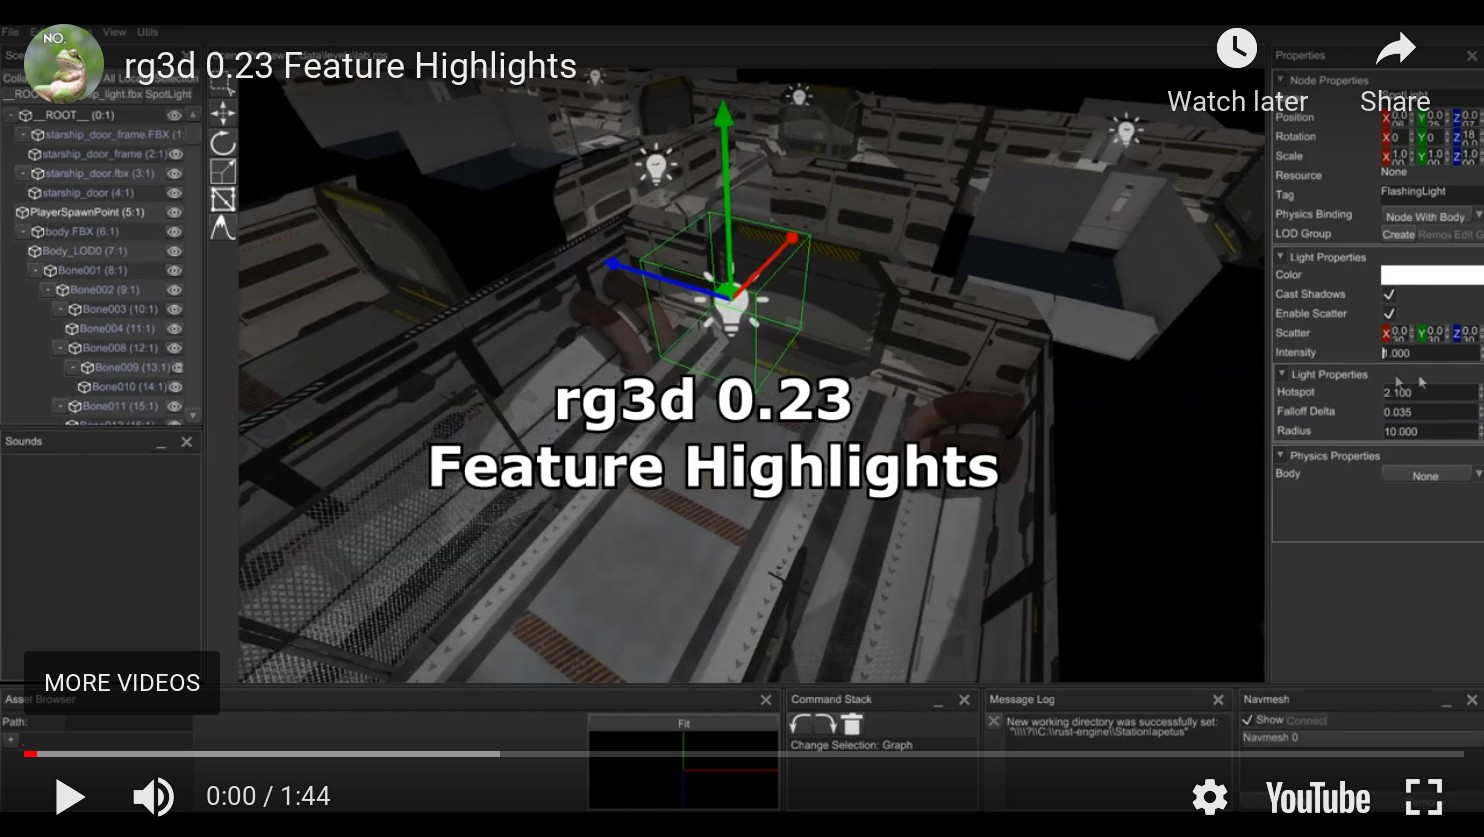 rg3d 0.23 feature highlights video